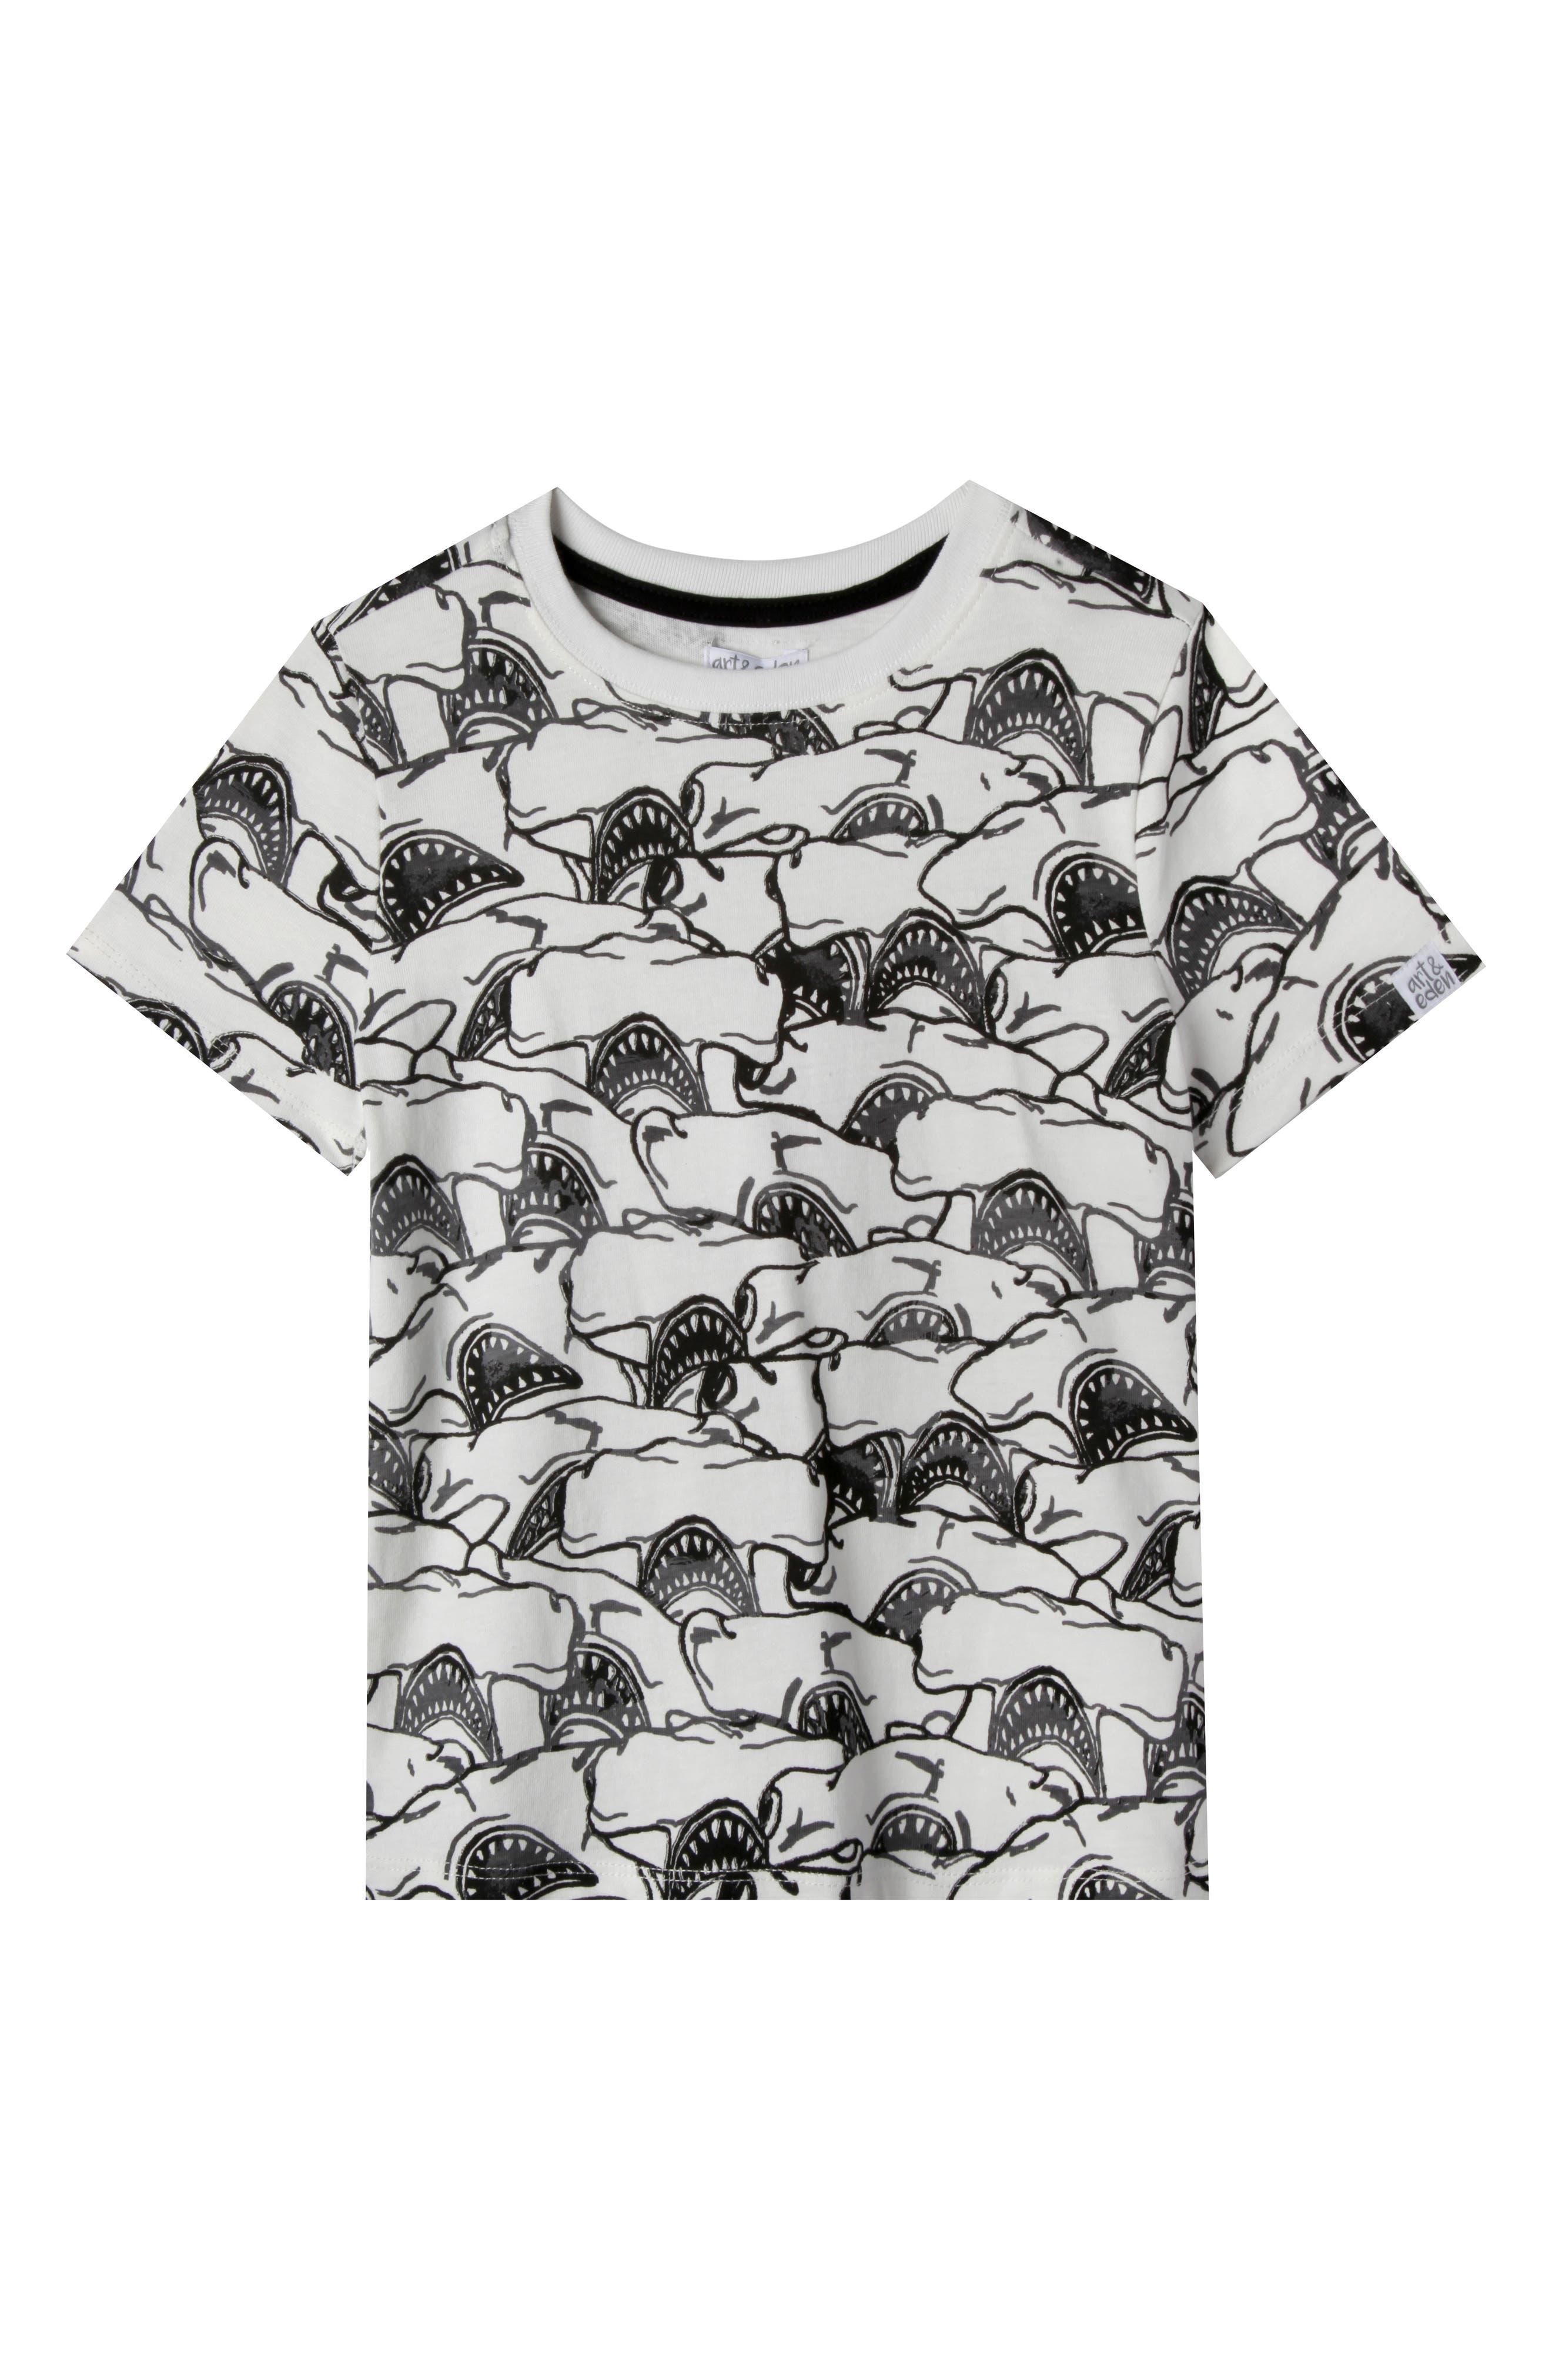 Henry Organic Cotton T-Shirt,                         Main,                         color, Black